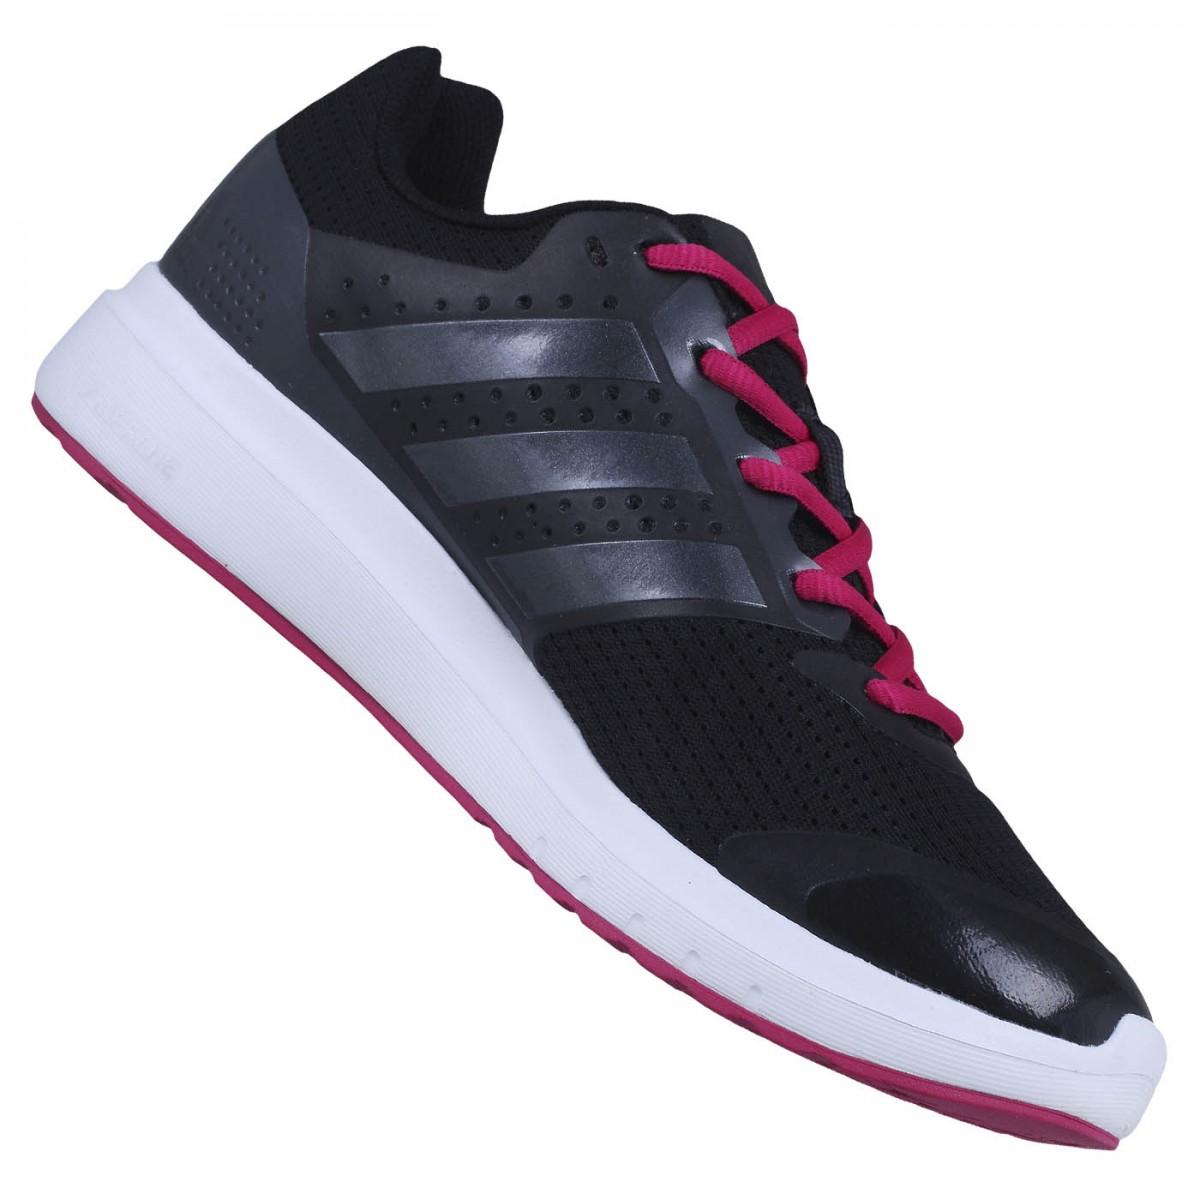 dd94706471 Tênis Adidas Duramo 7 - Feminino